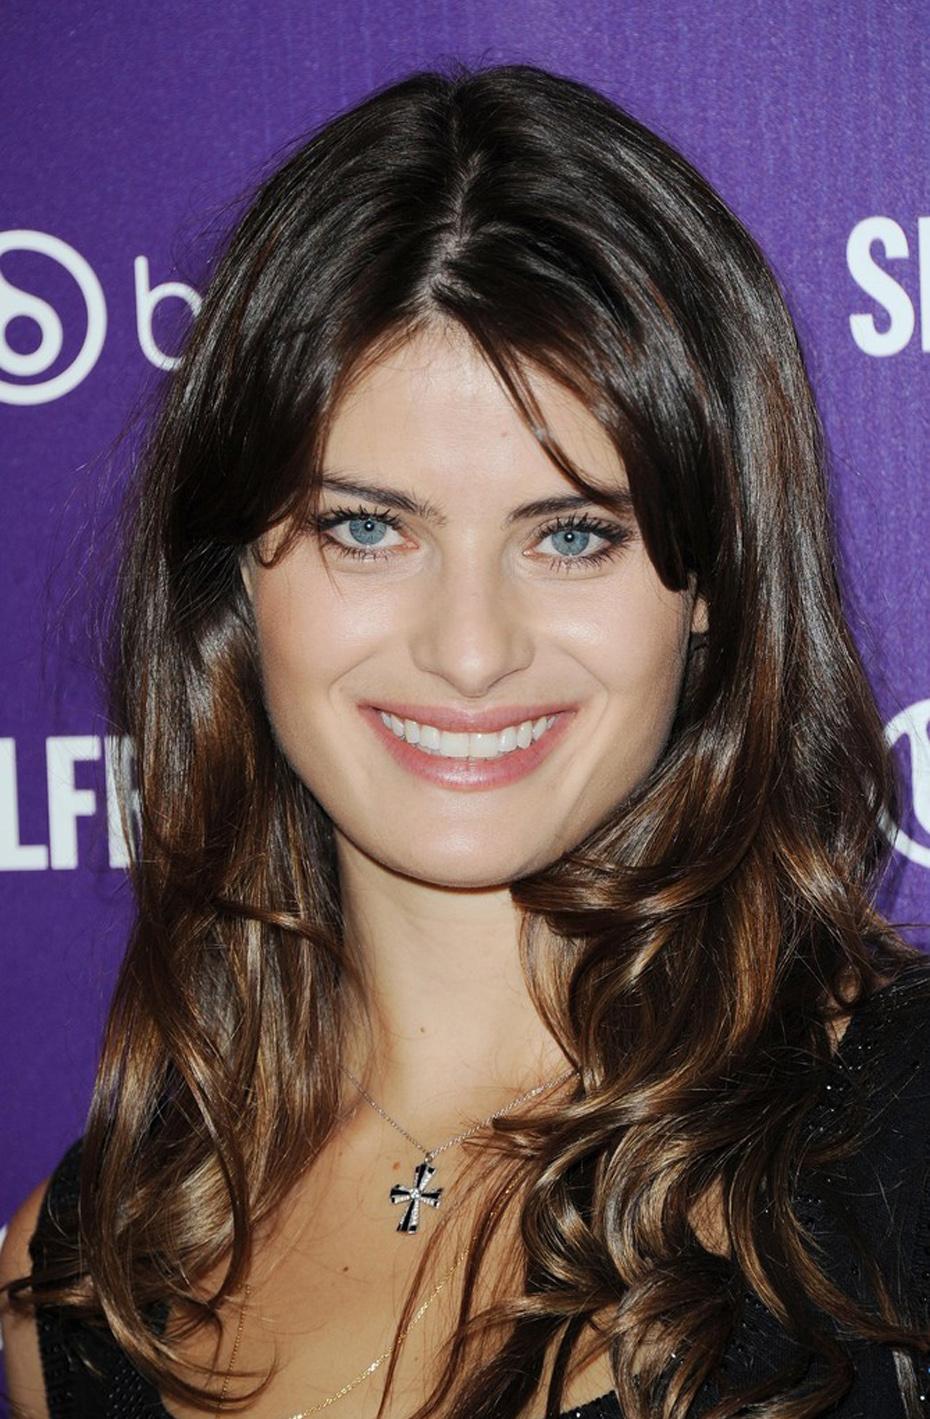 Isabelli Fontana Beautyline 0